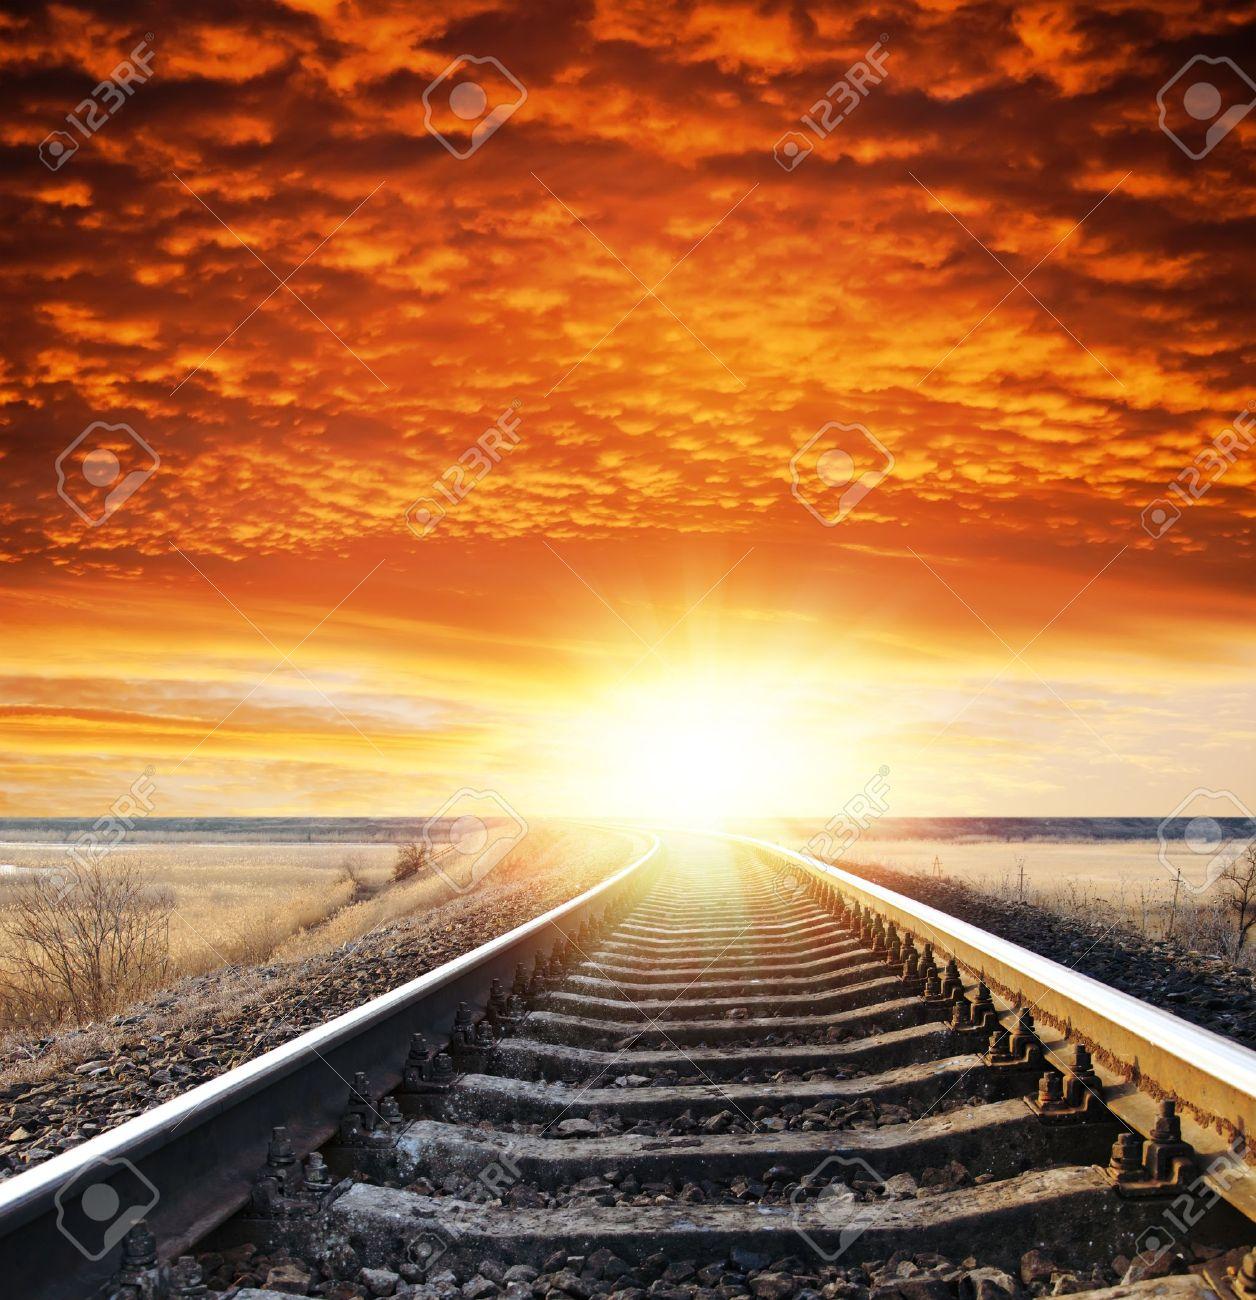 railway to sunset - 8949161